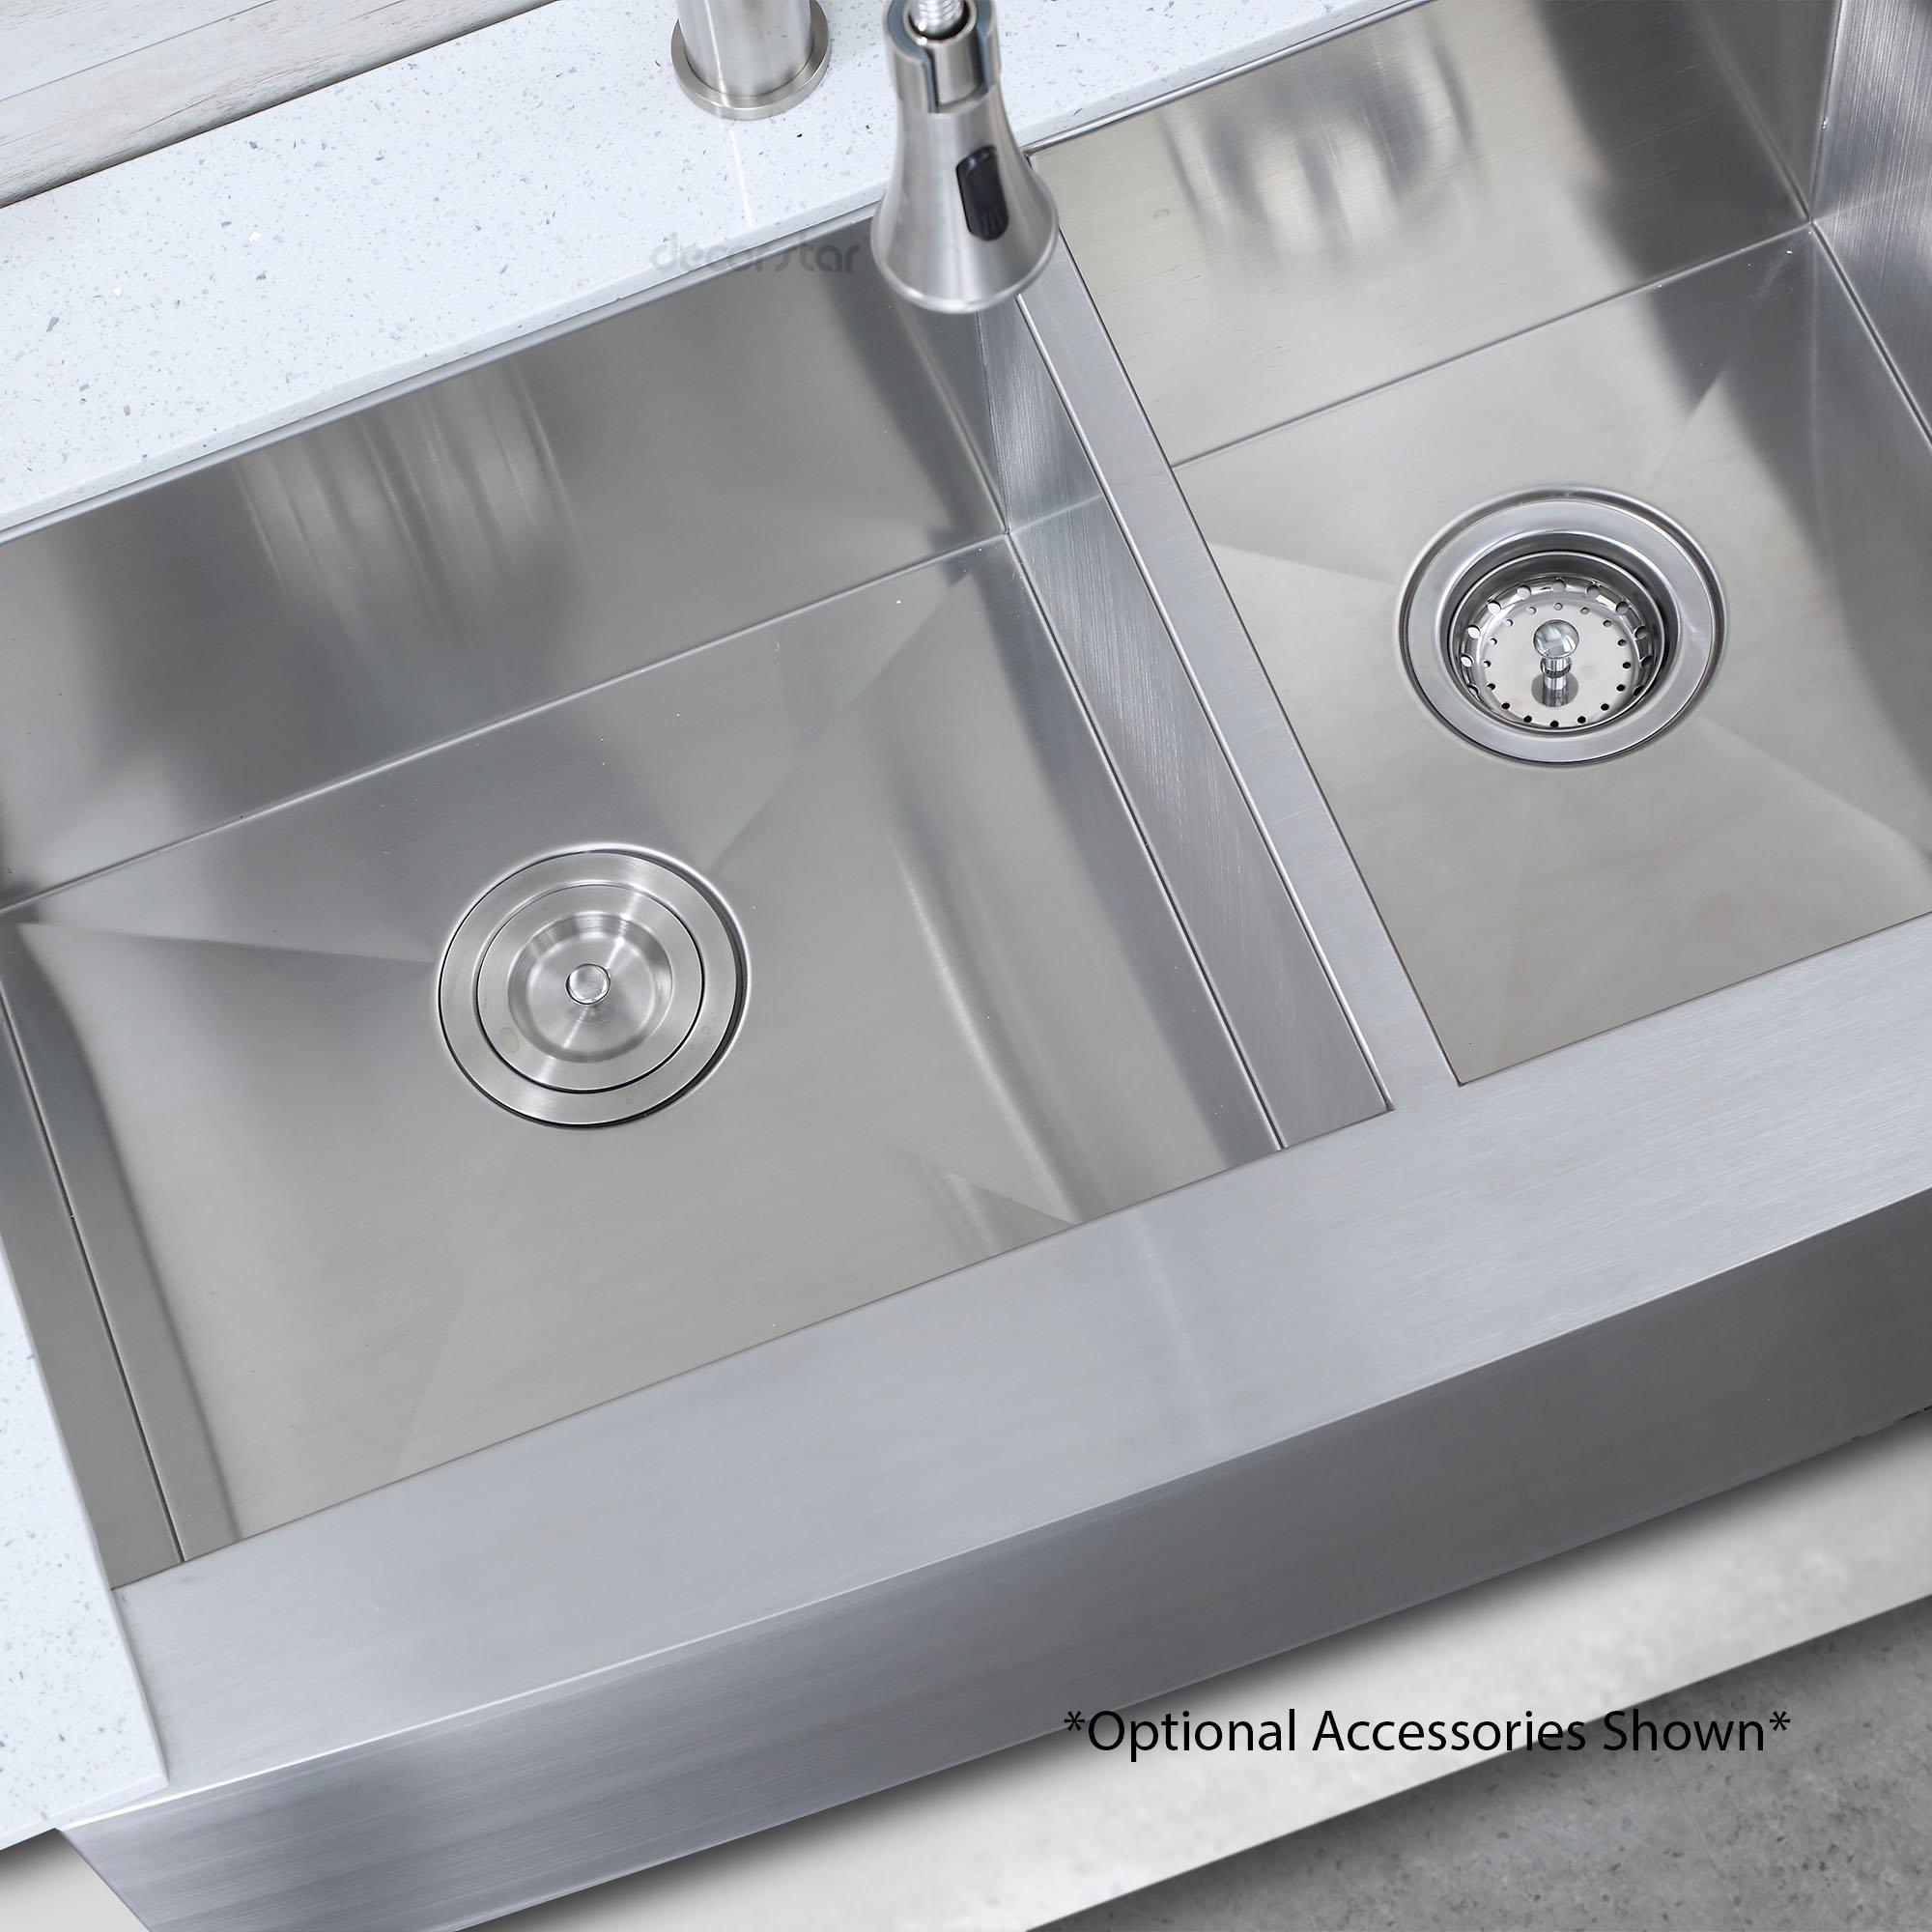 Decor Star F-002-Z 33 Inch x 20 Inch Farmhouse Apron 60/40 Offset Double Bowl 16 Gauge Stainless Steel Luxury Handmade Kitchen Sink cUPC Zero Radius by Décor Star (Image #4)